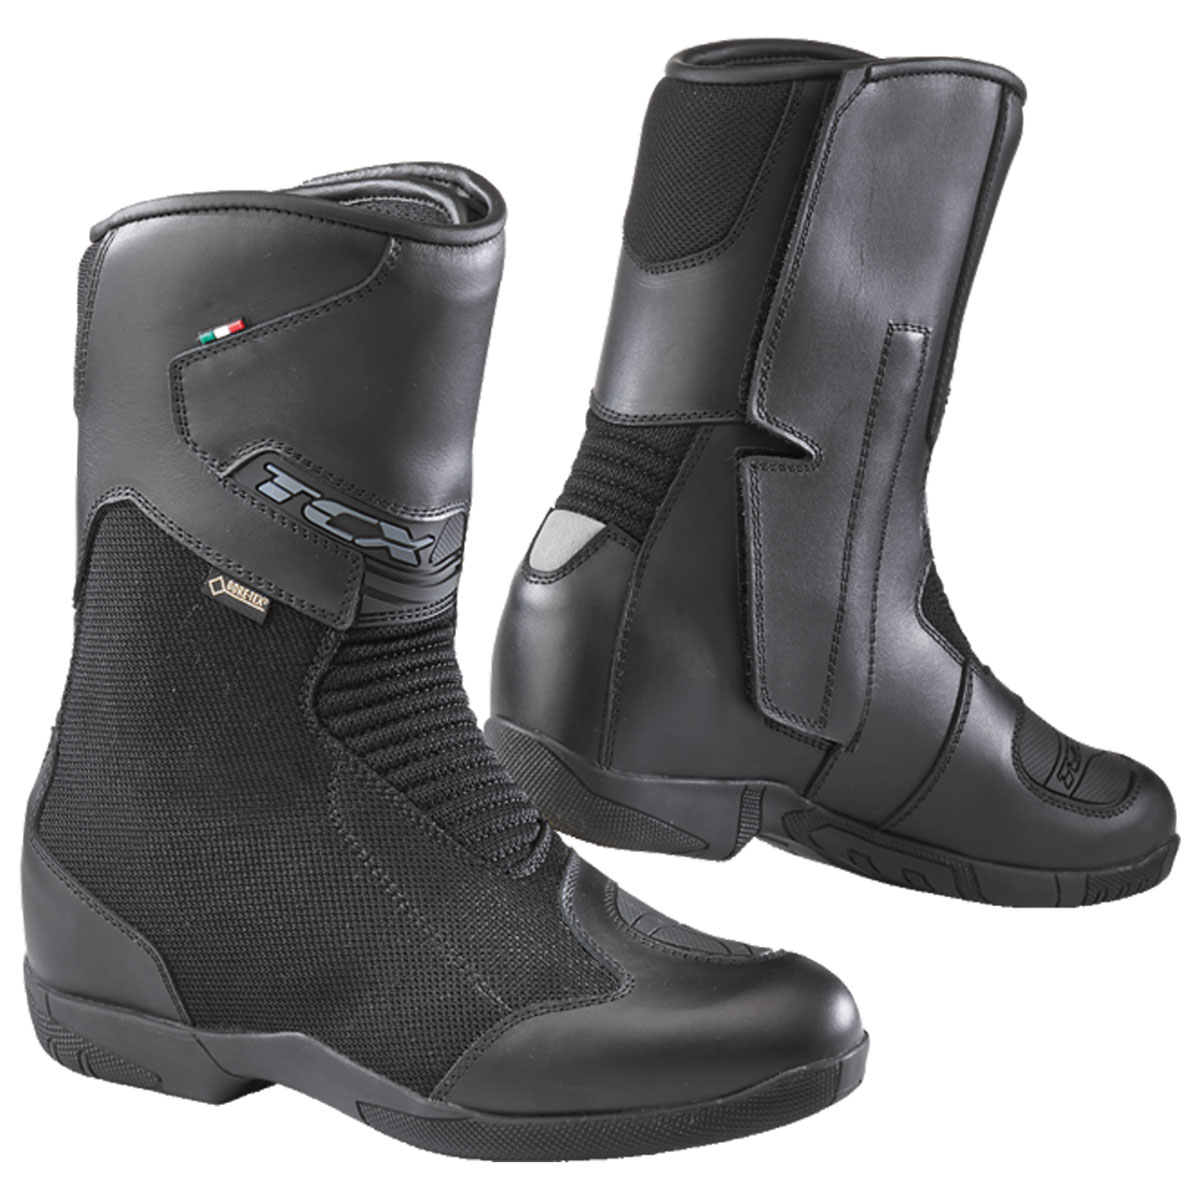 TCX Women's Tourer Gore-Tex Black Boots